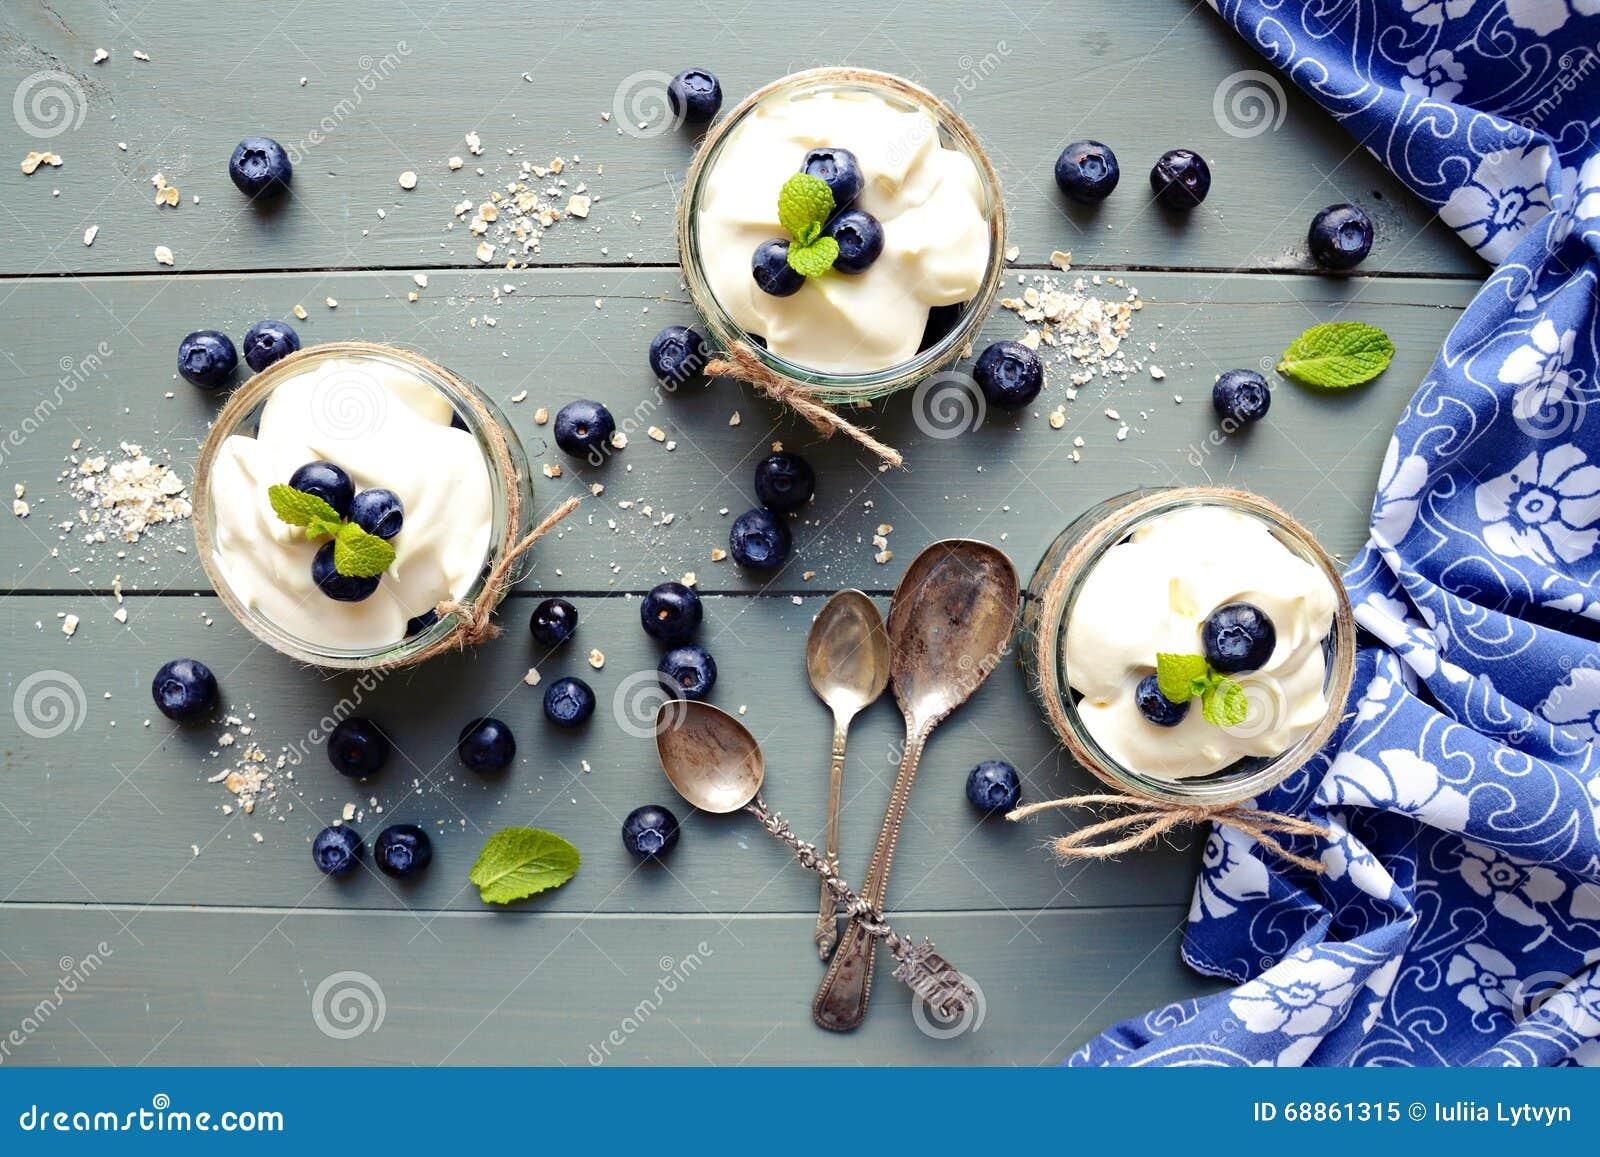 Granola desserts